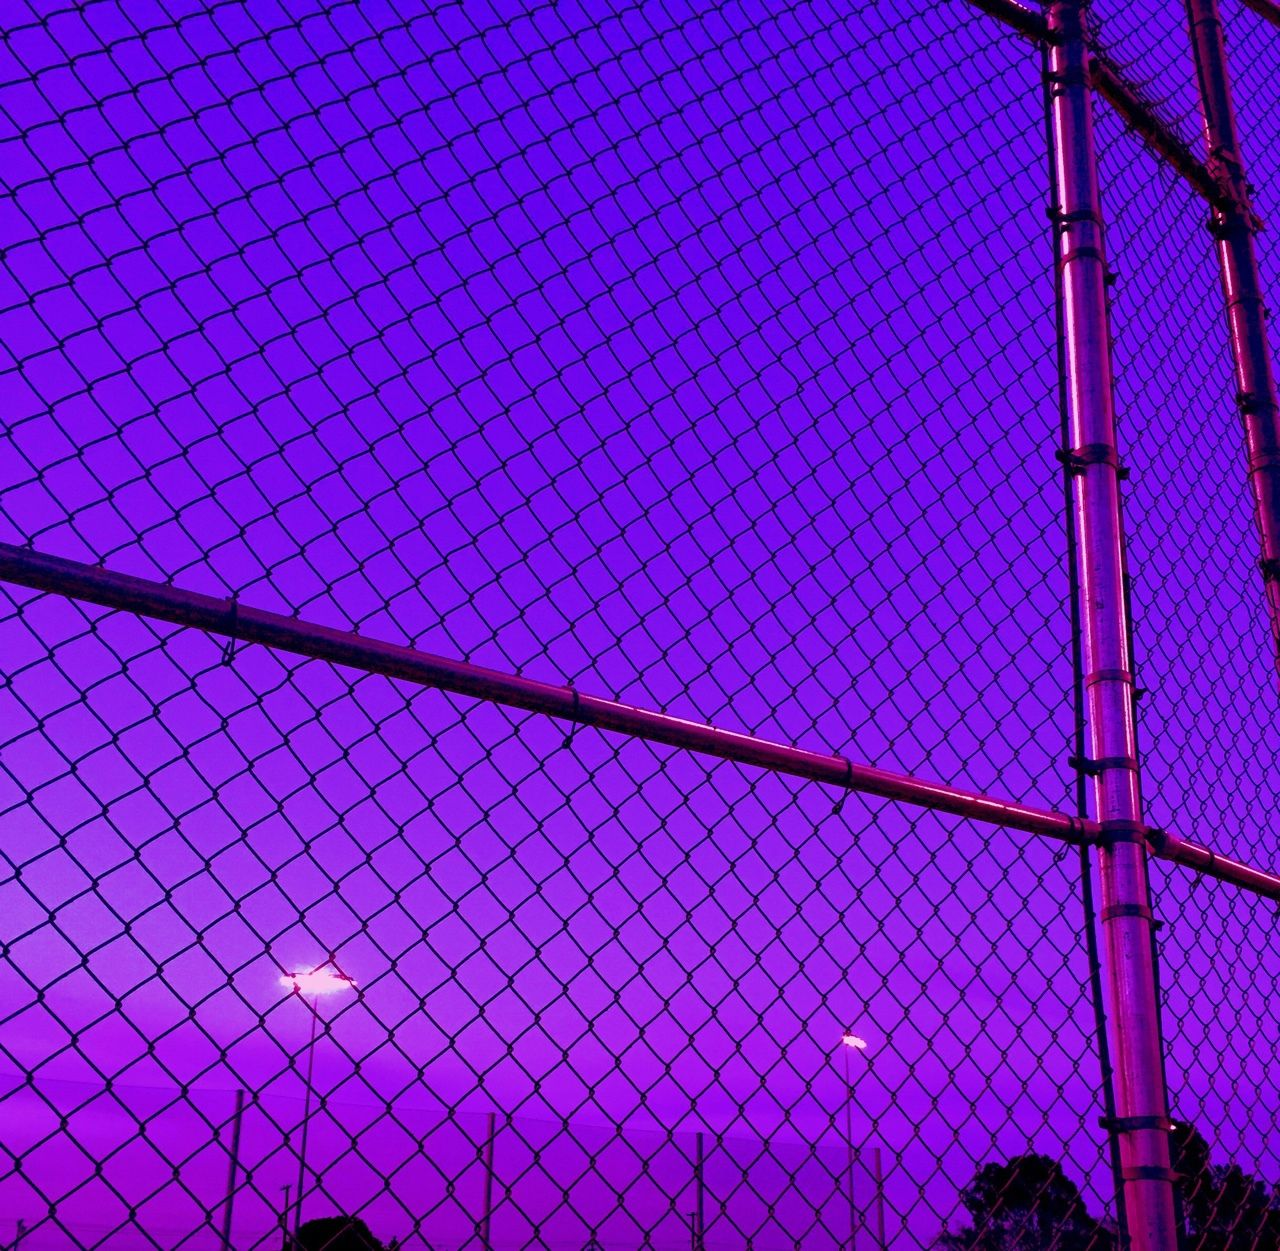 PURPLE-AESTHETIC   Neblina Púrpura   Pinterest   Aesthetic ...